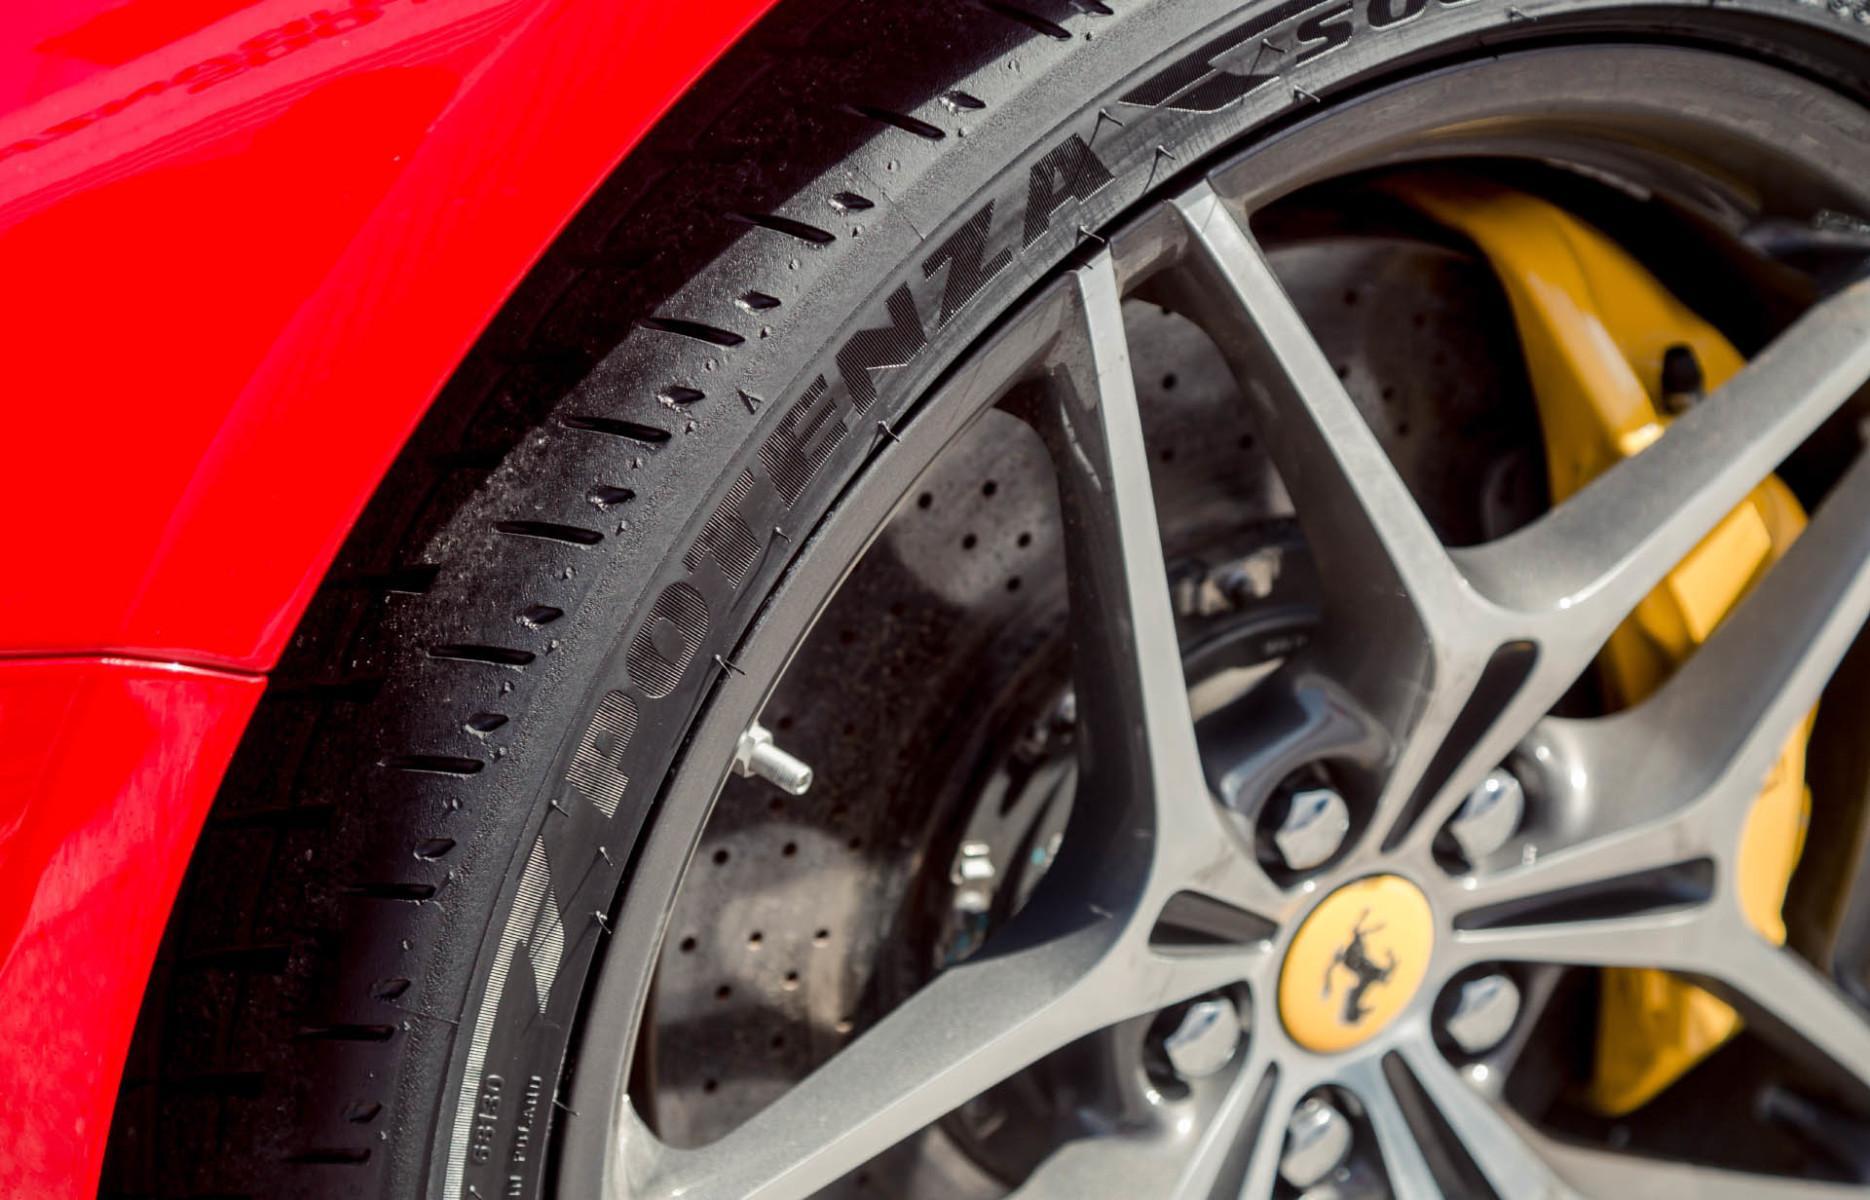 Колеса.ру: Разница в потенциалах тест-обзор шин Bridgestone Turanza Т005 и Bridgestone Potenza S007а